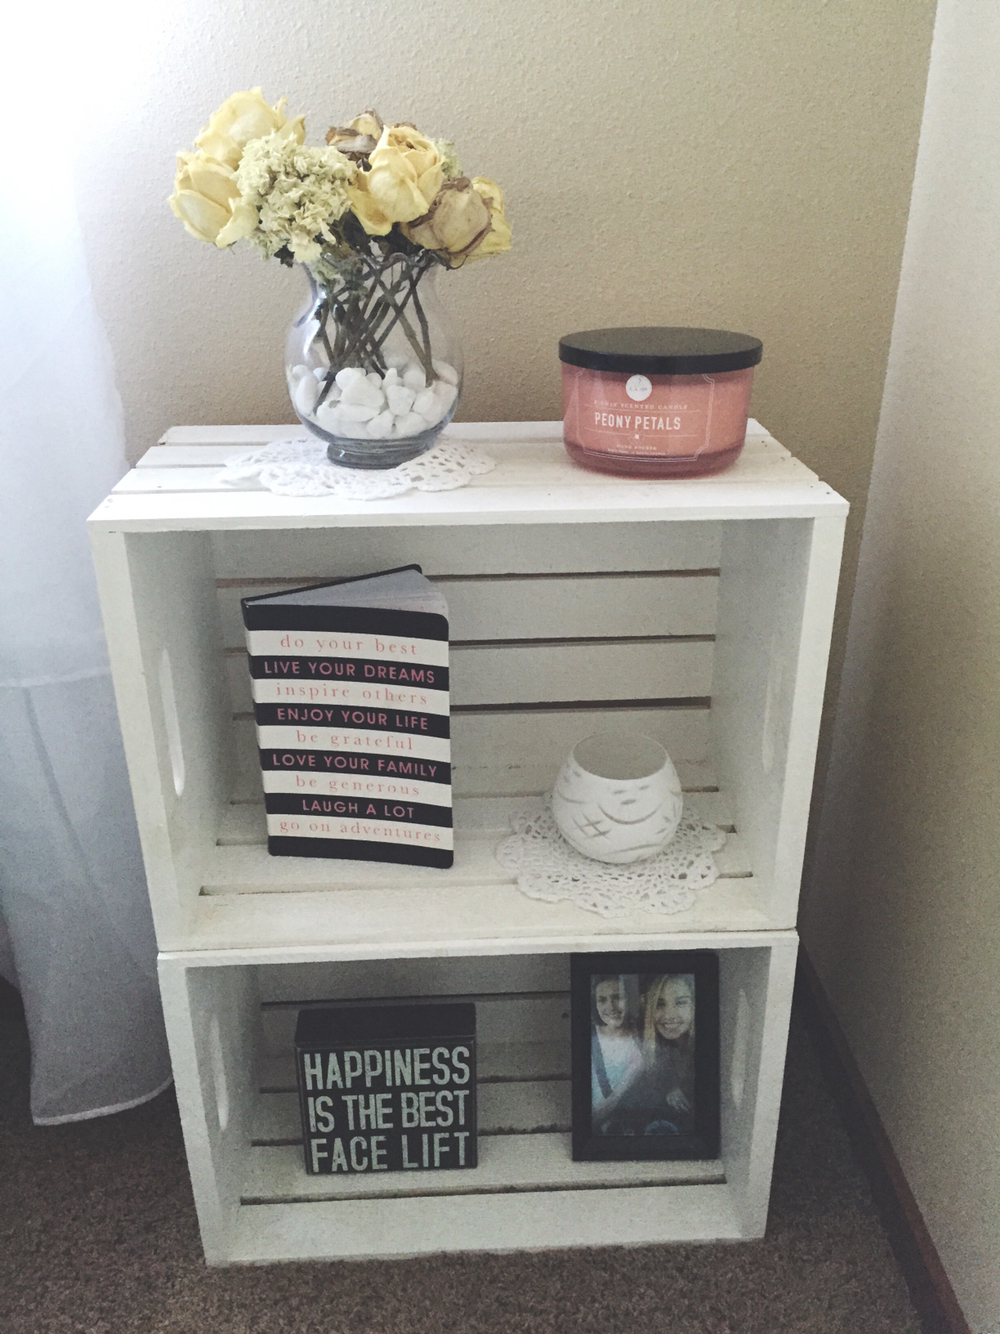 15 ideas creativas para decorar con cajas madera for Ideas con cajas de madera